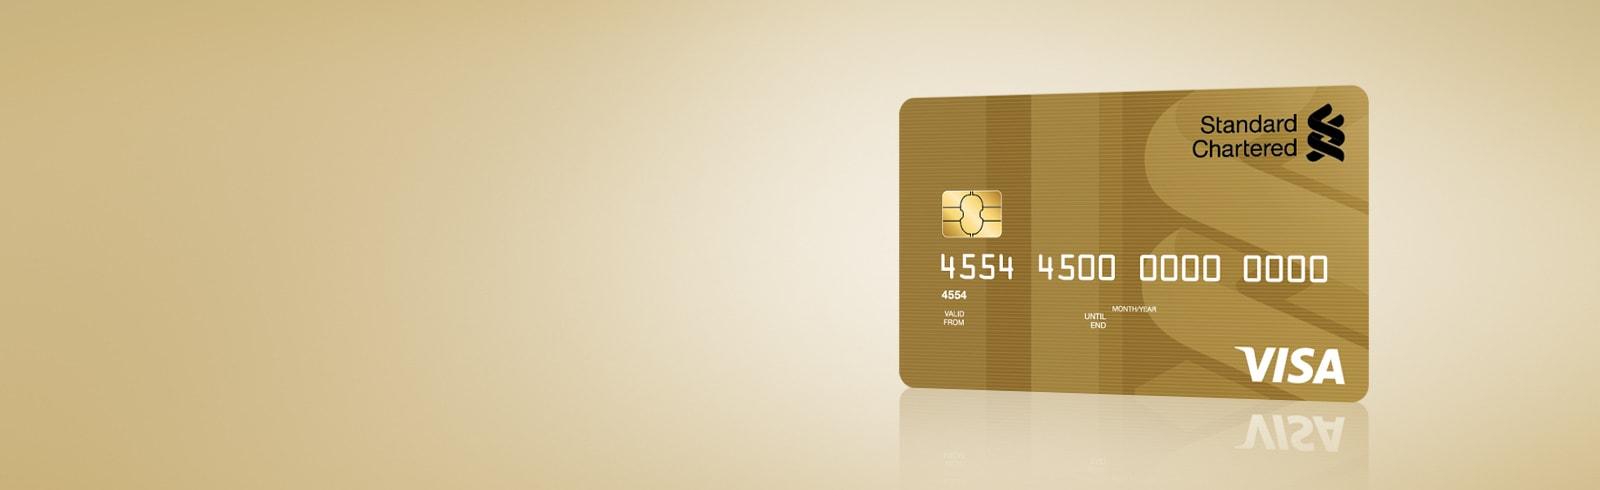 Gold visa card bannerx